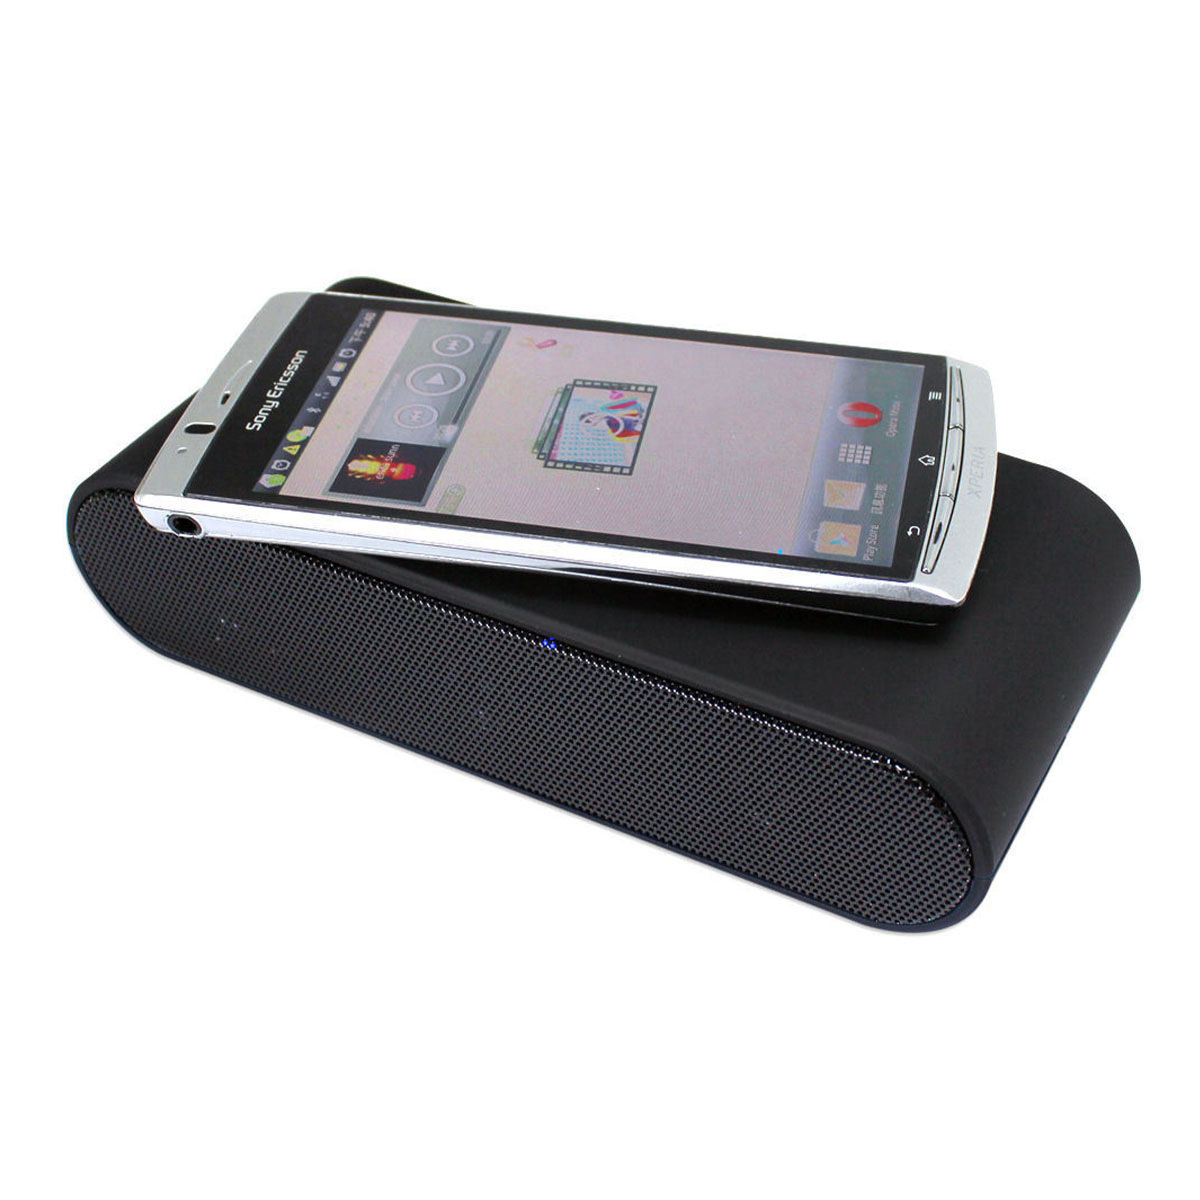 98-1108-01-mobiler-lautsprecher-für-smartphones-touchplay-upbeat-anwendung3-1200x1200px.jpg